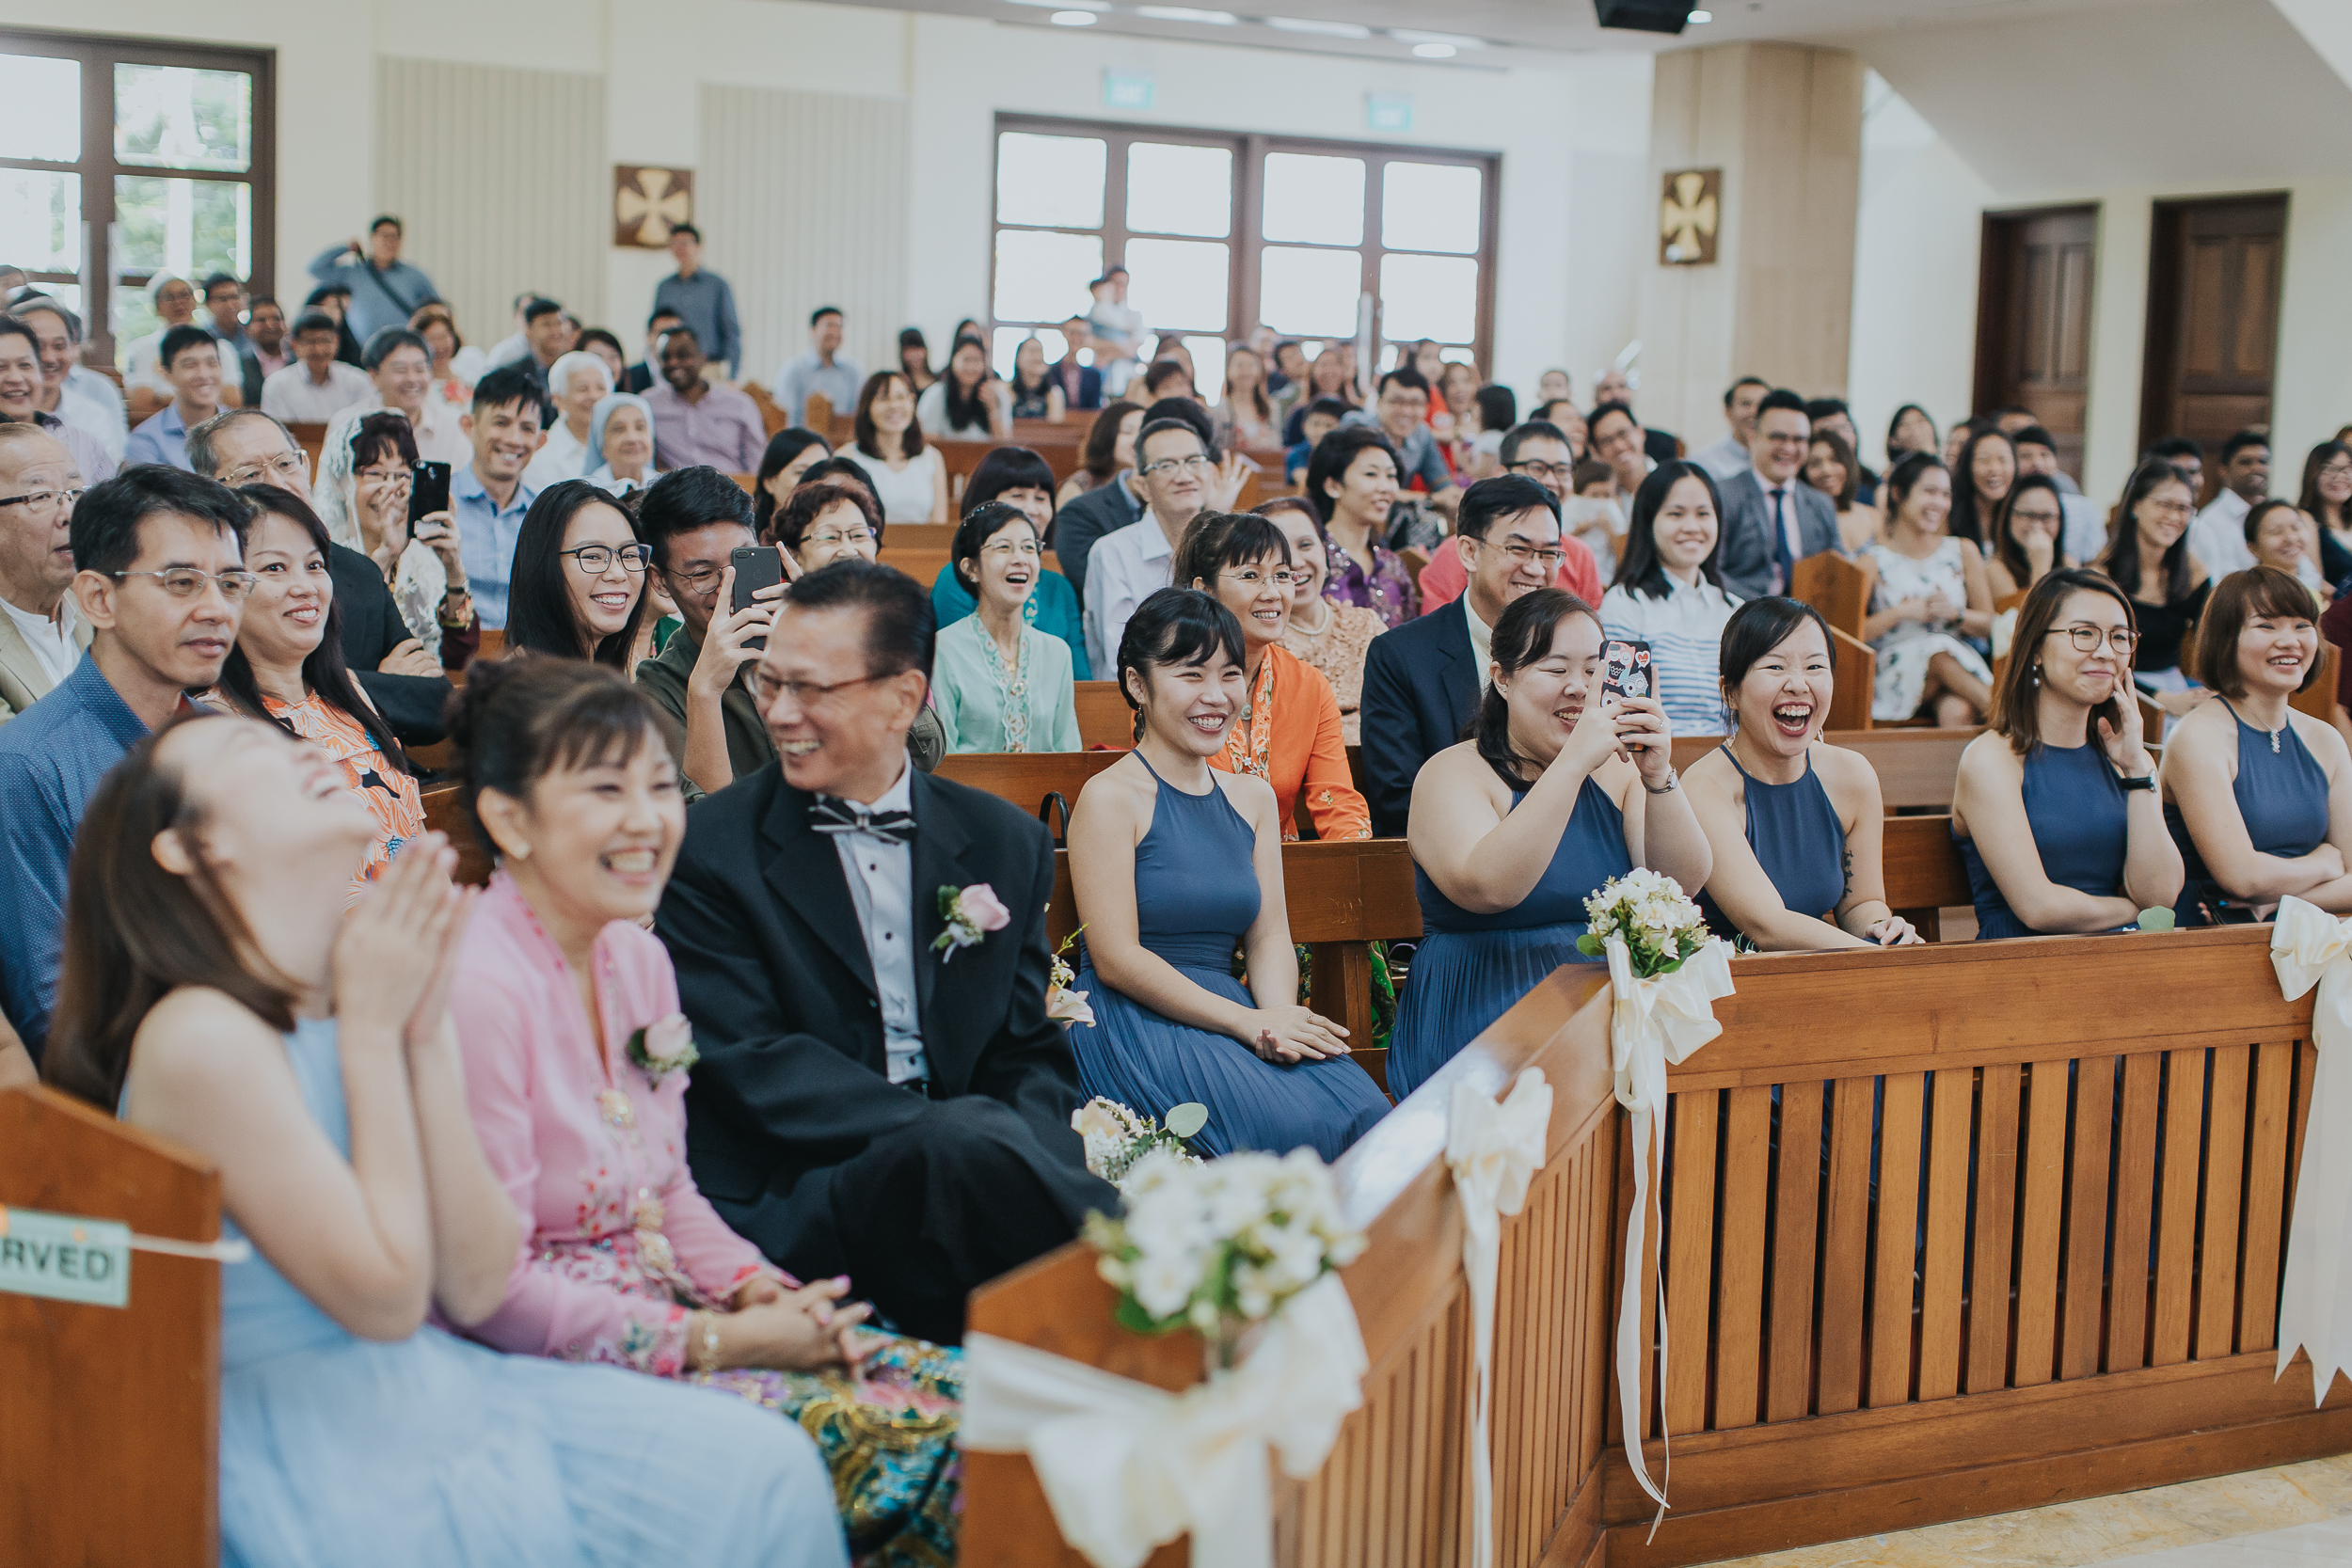 Singapore+Actual+Day+Wedding+Photographer+Grand+Mercure+Oliver+Estelle-0054.jpg